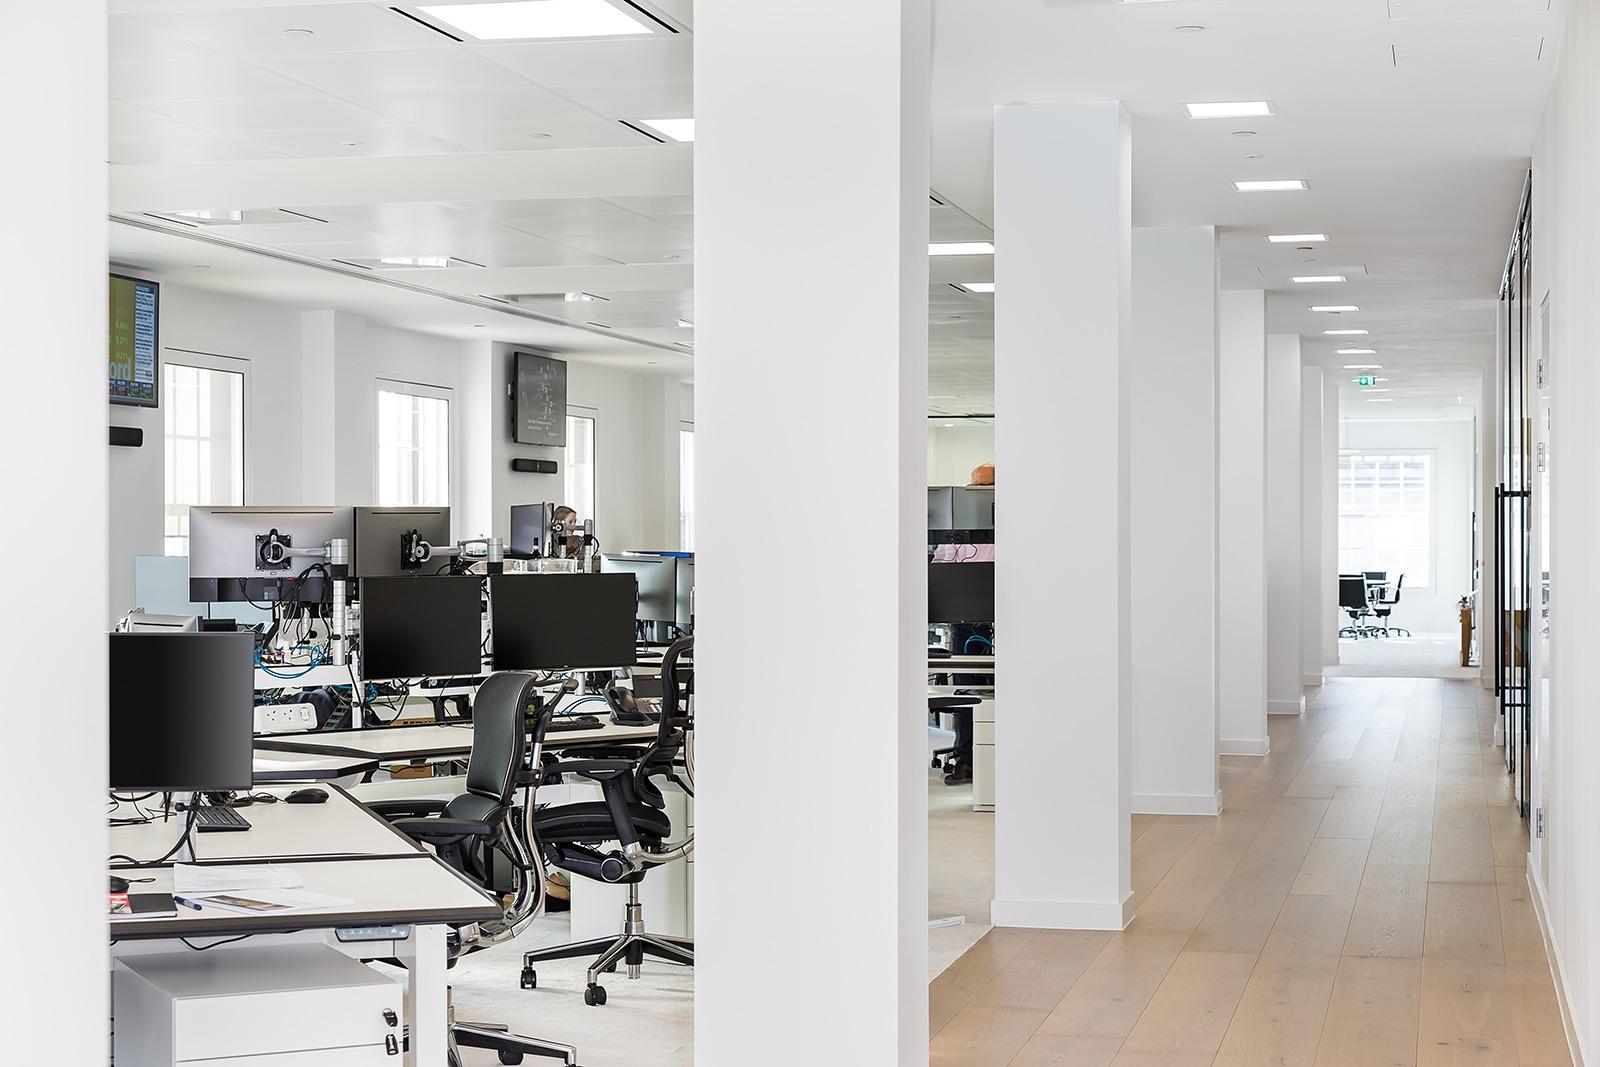 svp-global-oktra-office-6